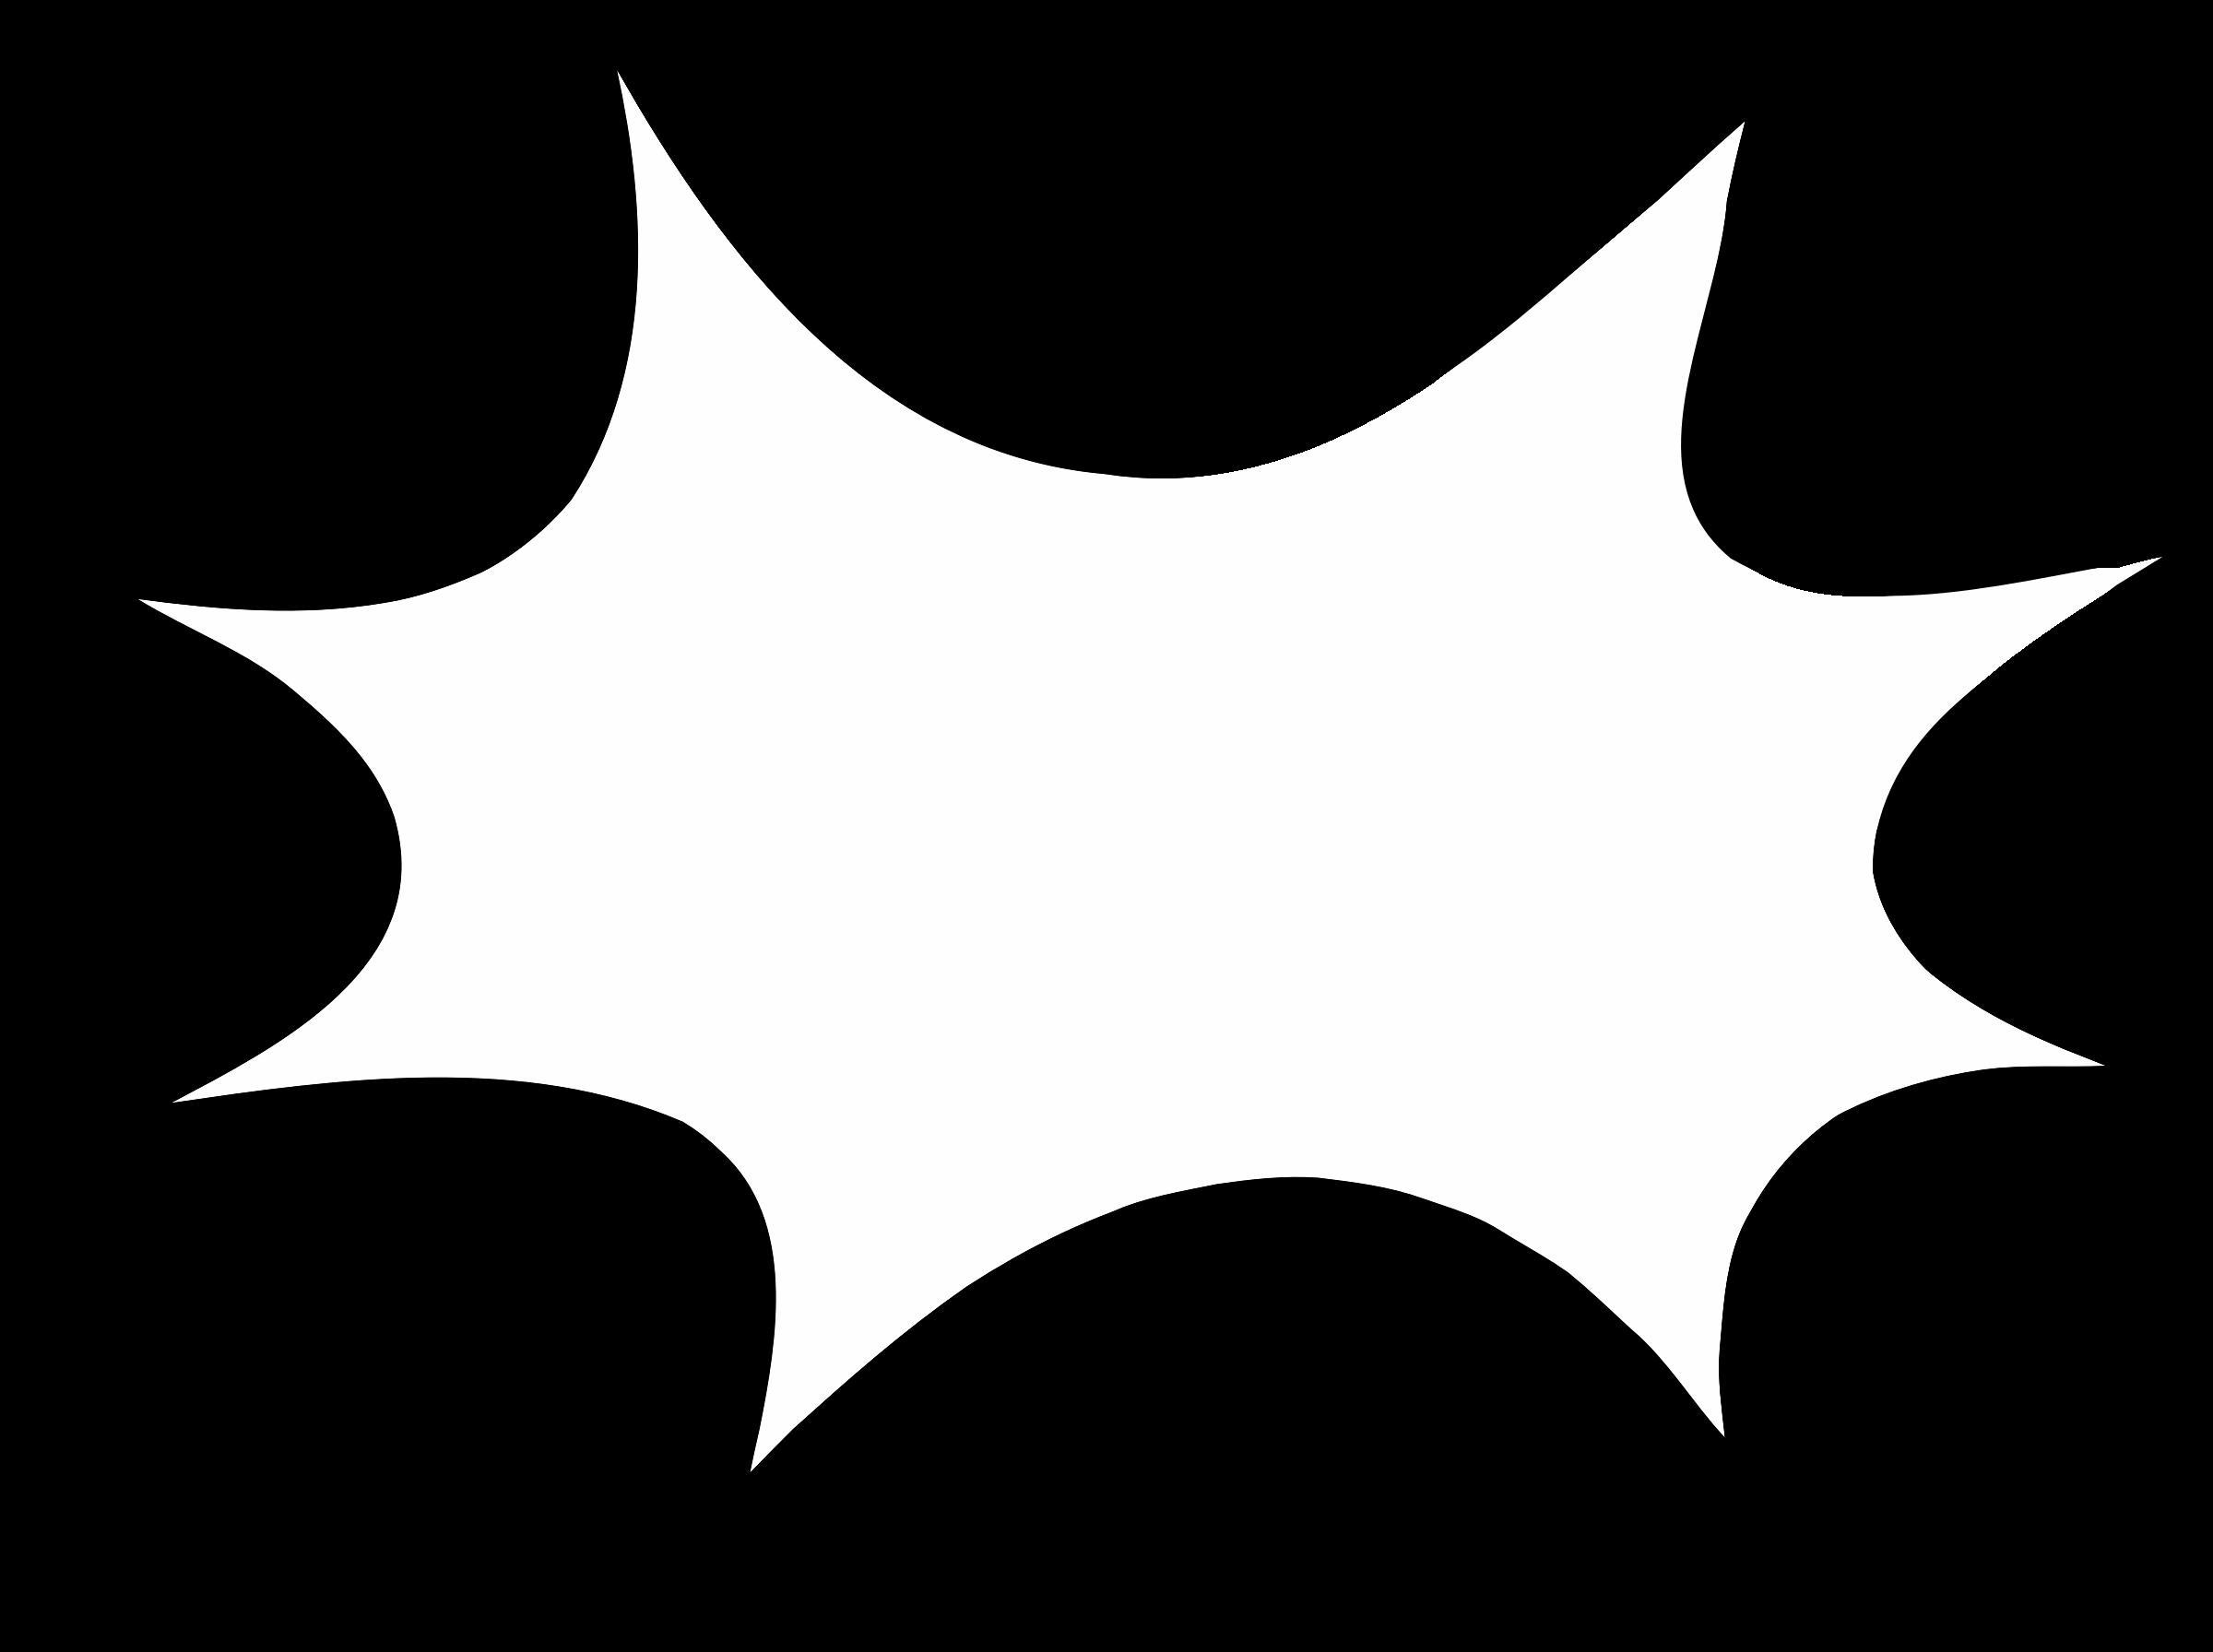 Clipart - Starburst 003 image freeuse download